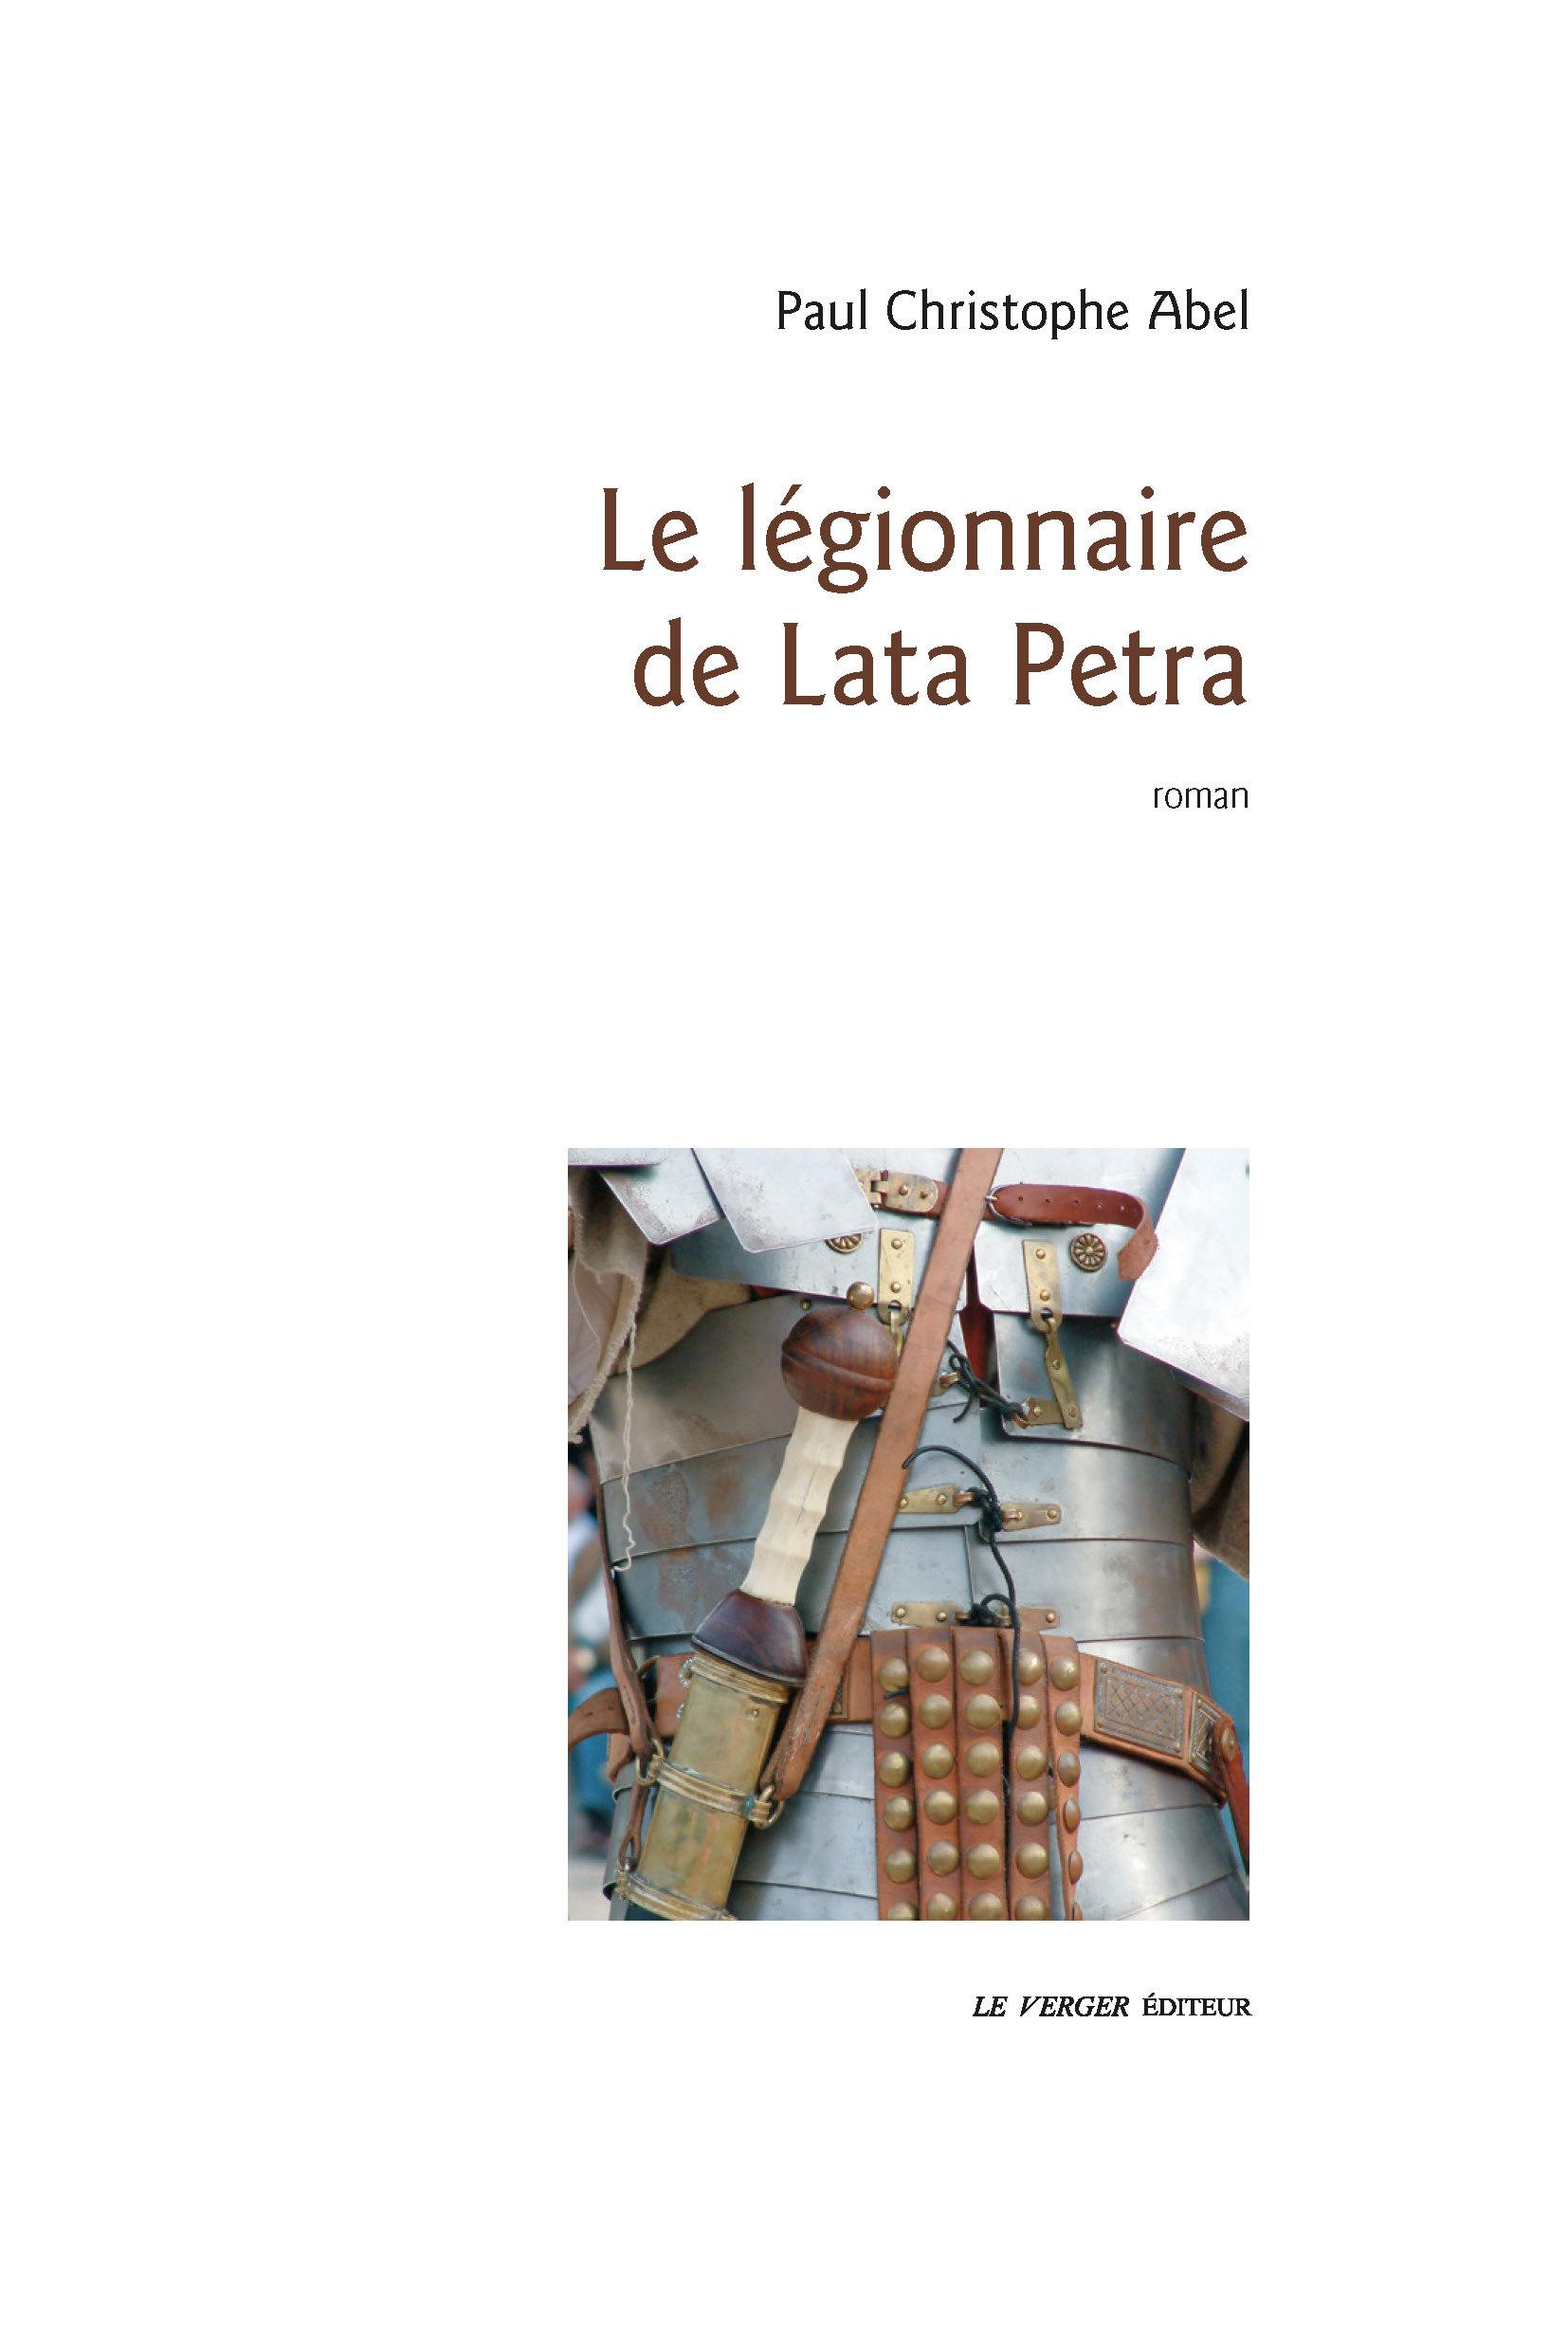 LE LEGIONNAIRE DE LATA PETRA